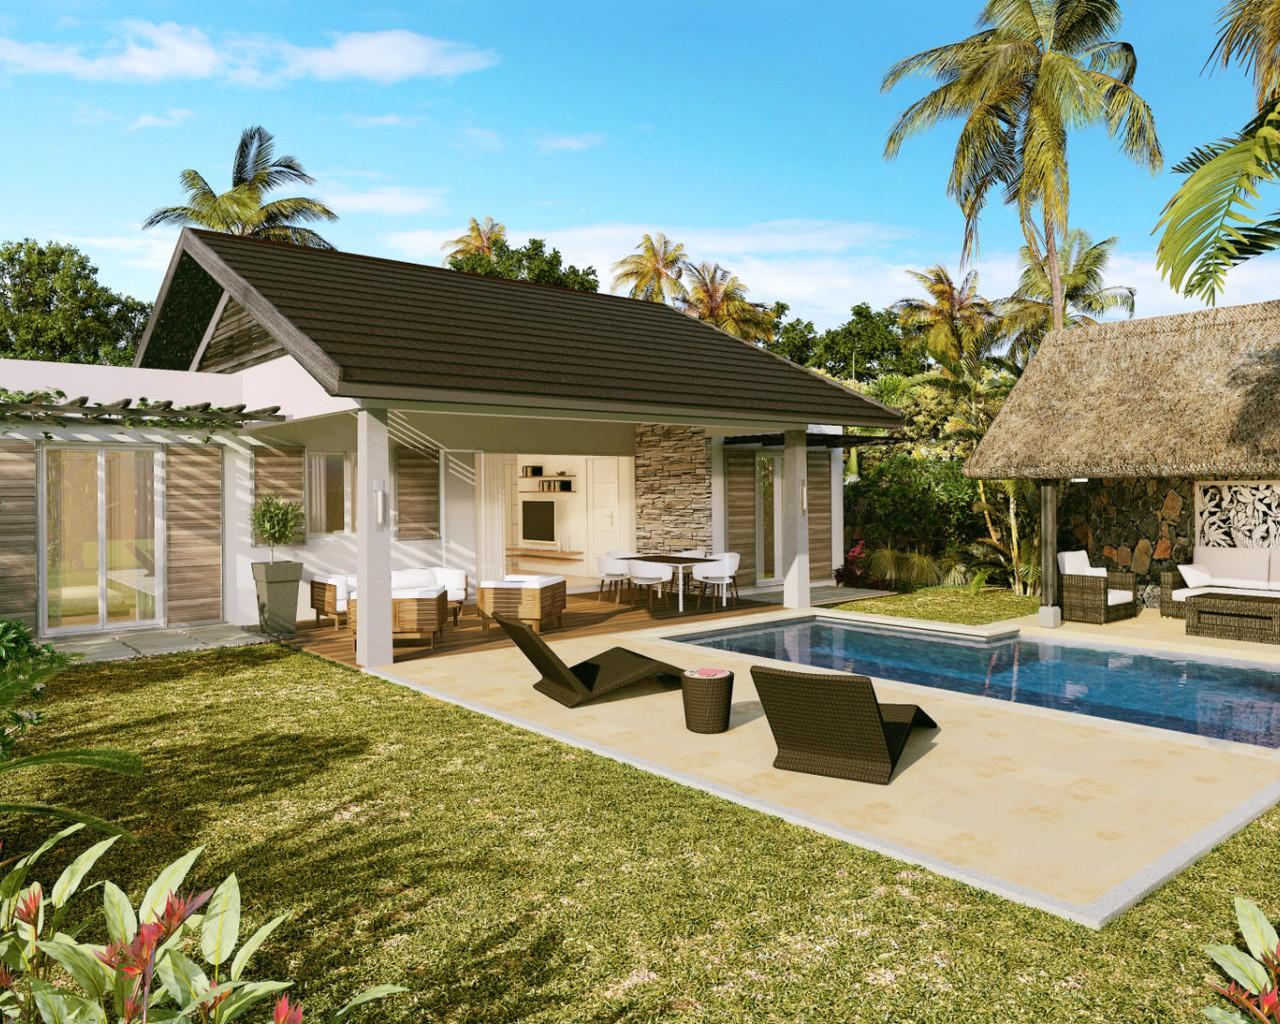 2 Bedroom Villa For Sale in Grand Baie